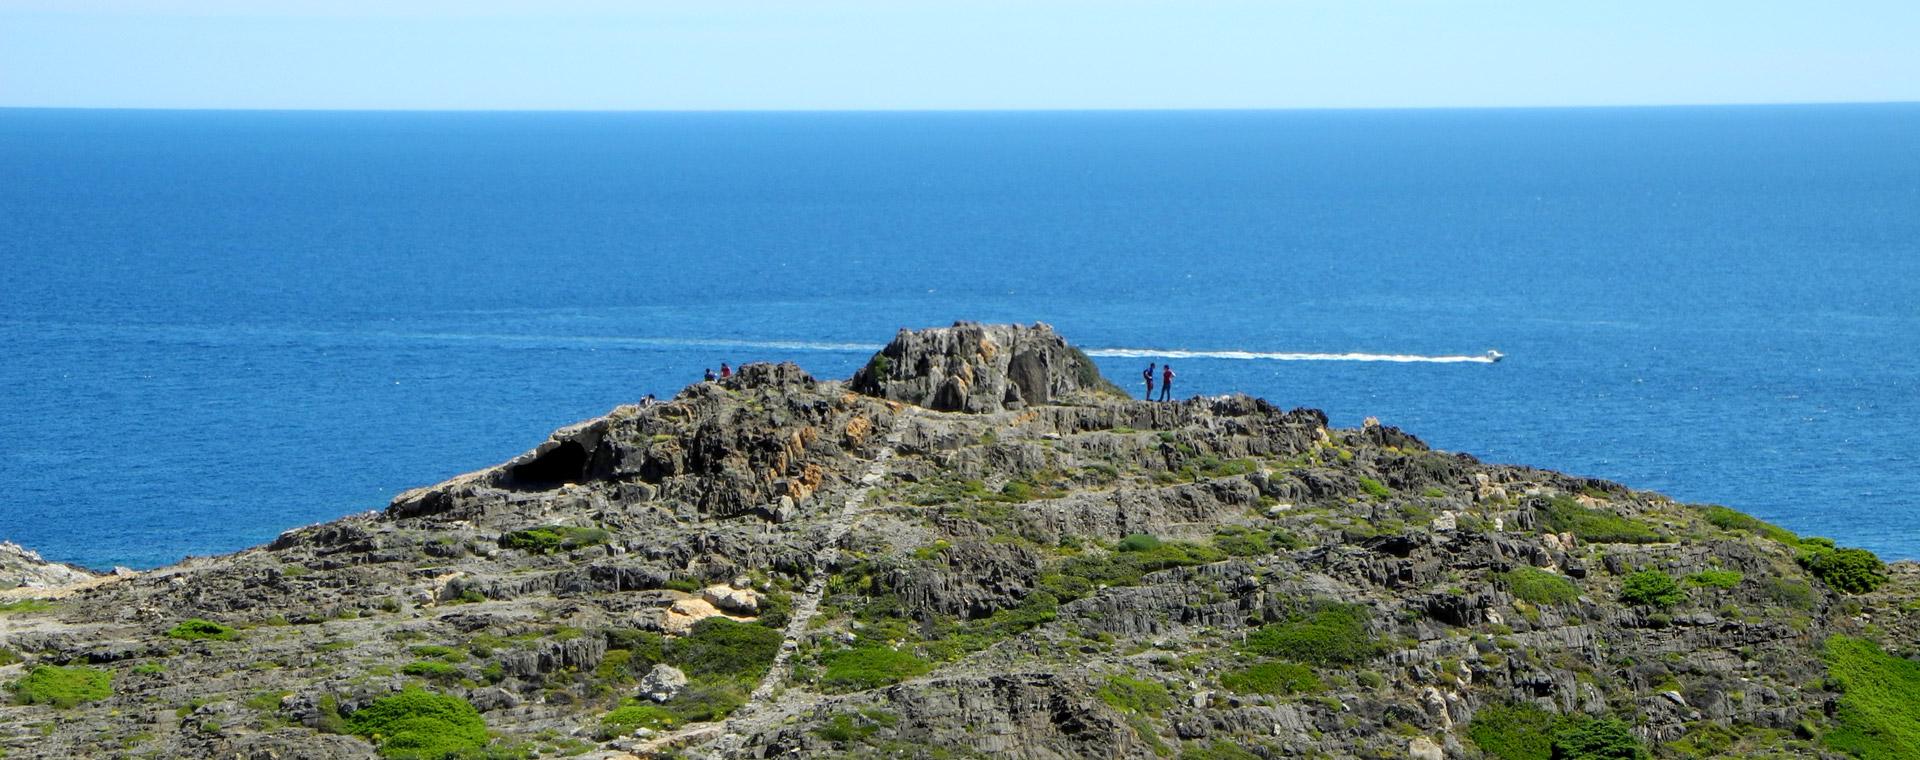 Image De Collioure à Cadaqués